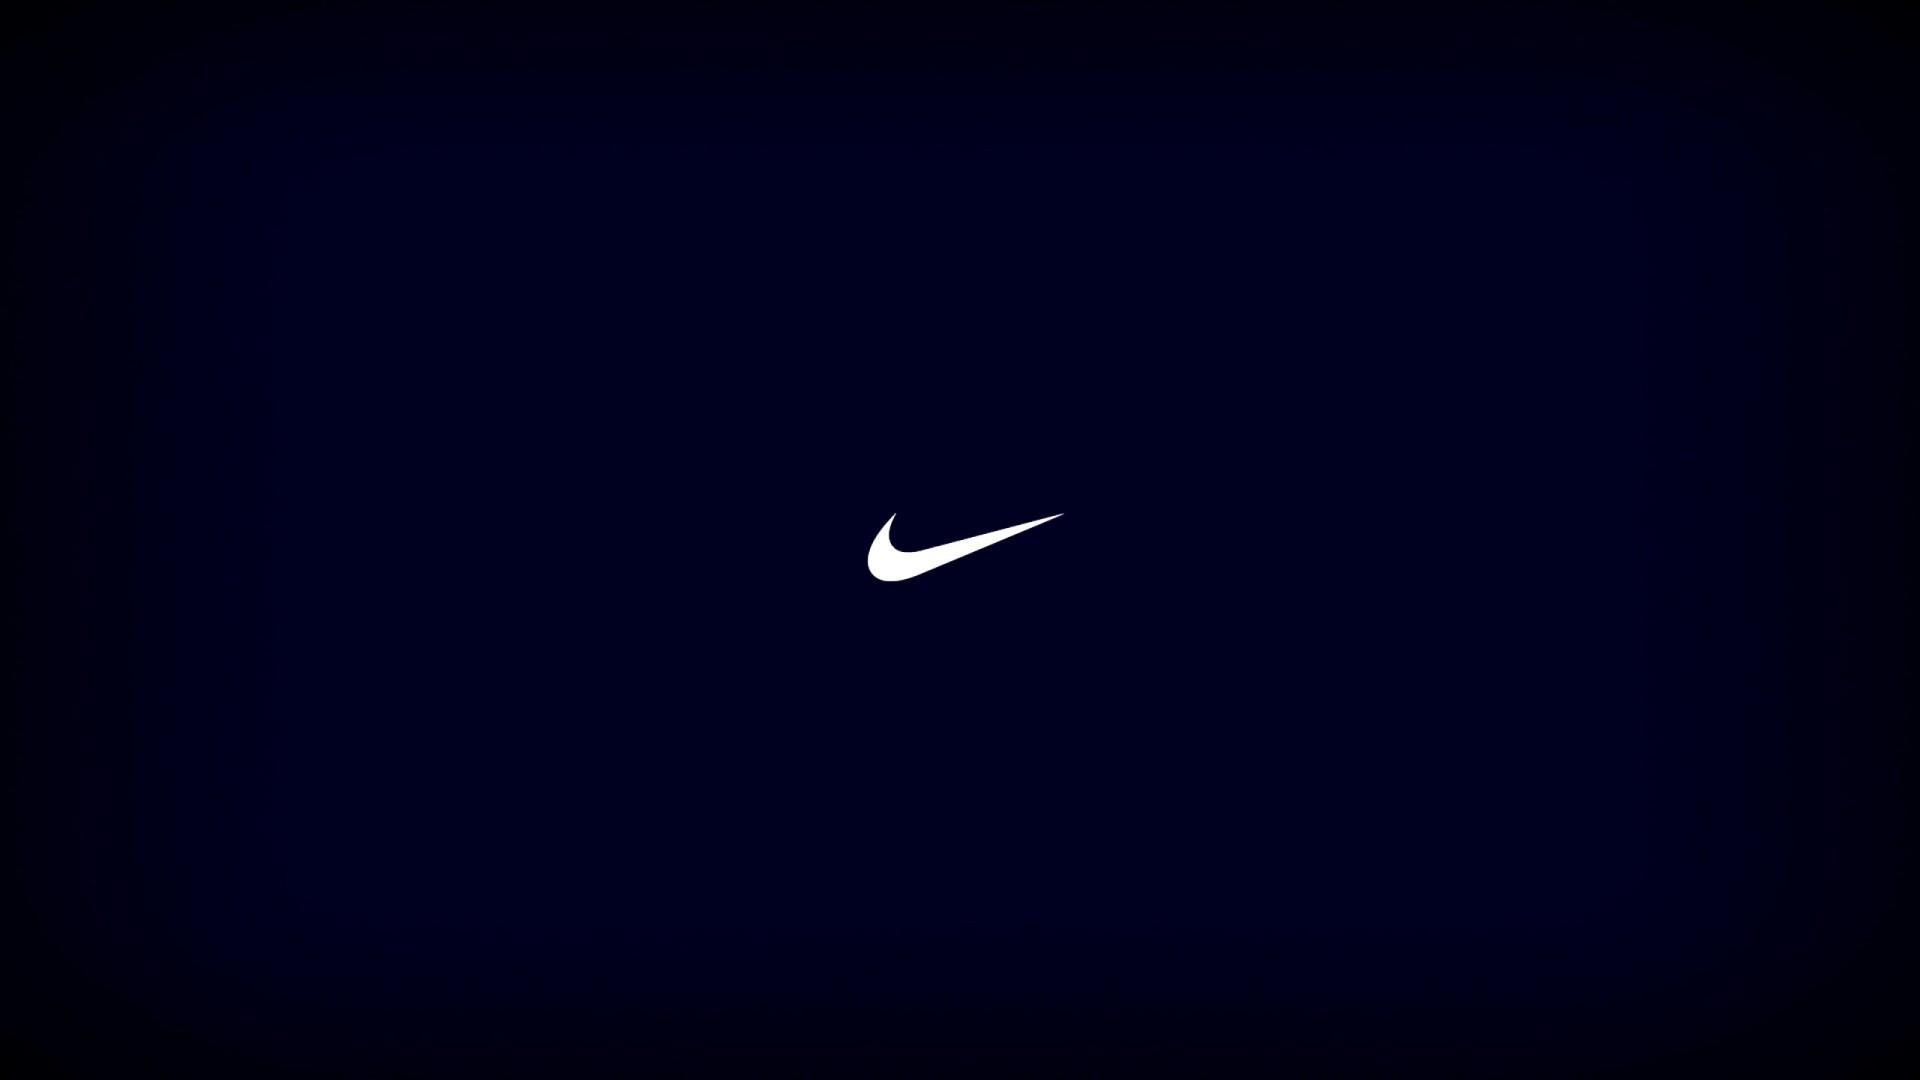 Nike Basketball Logo Wallpaper HD #11848 Wallpaper | High Resolution .